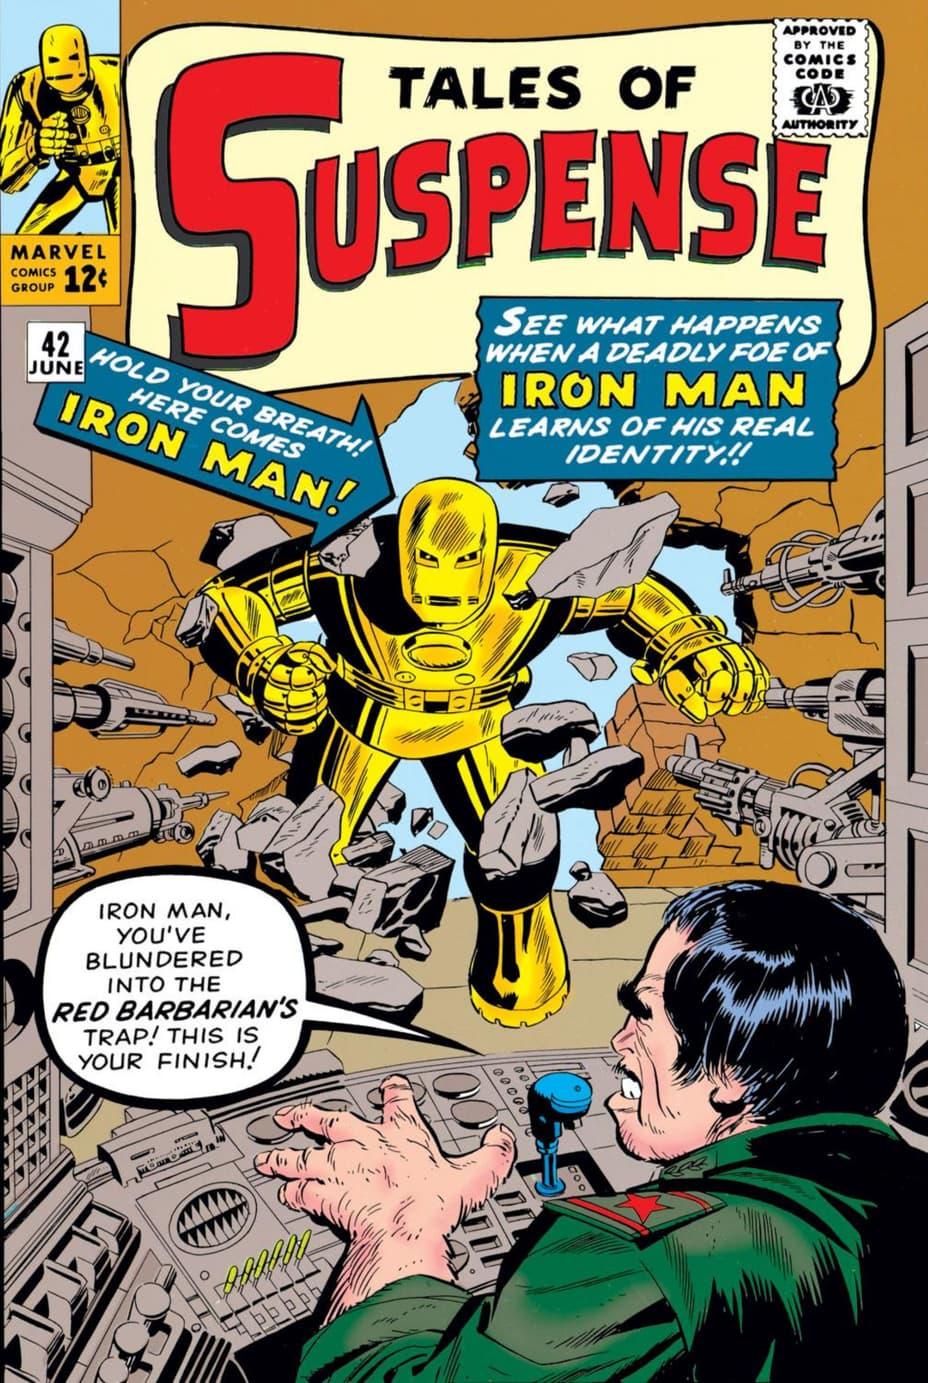 Gold Iron Man Suit